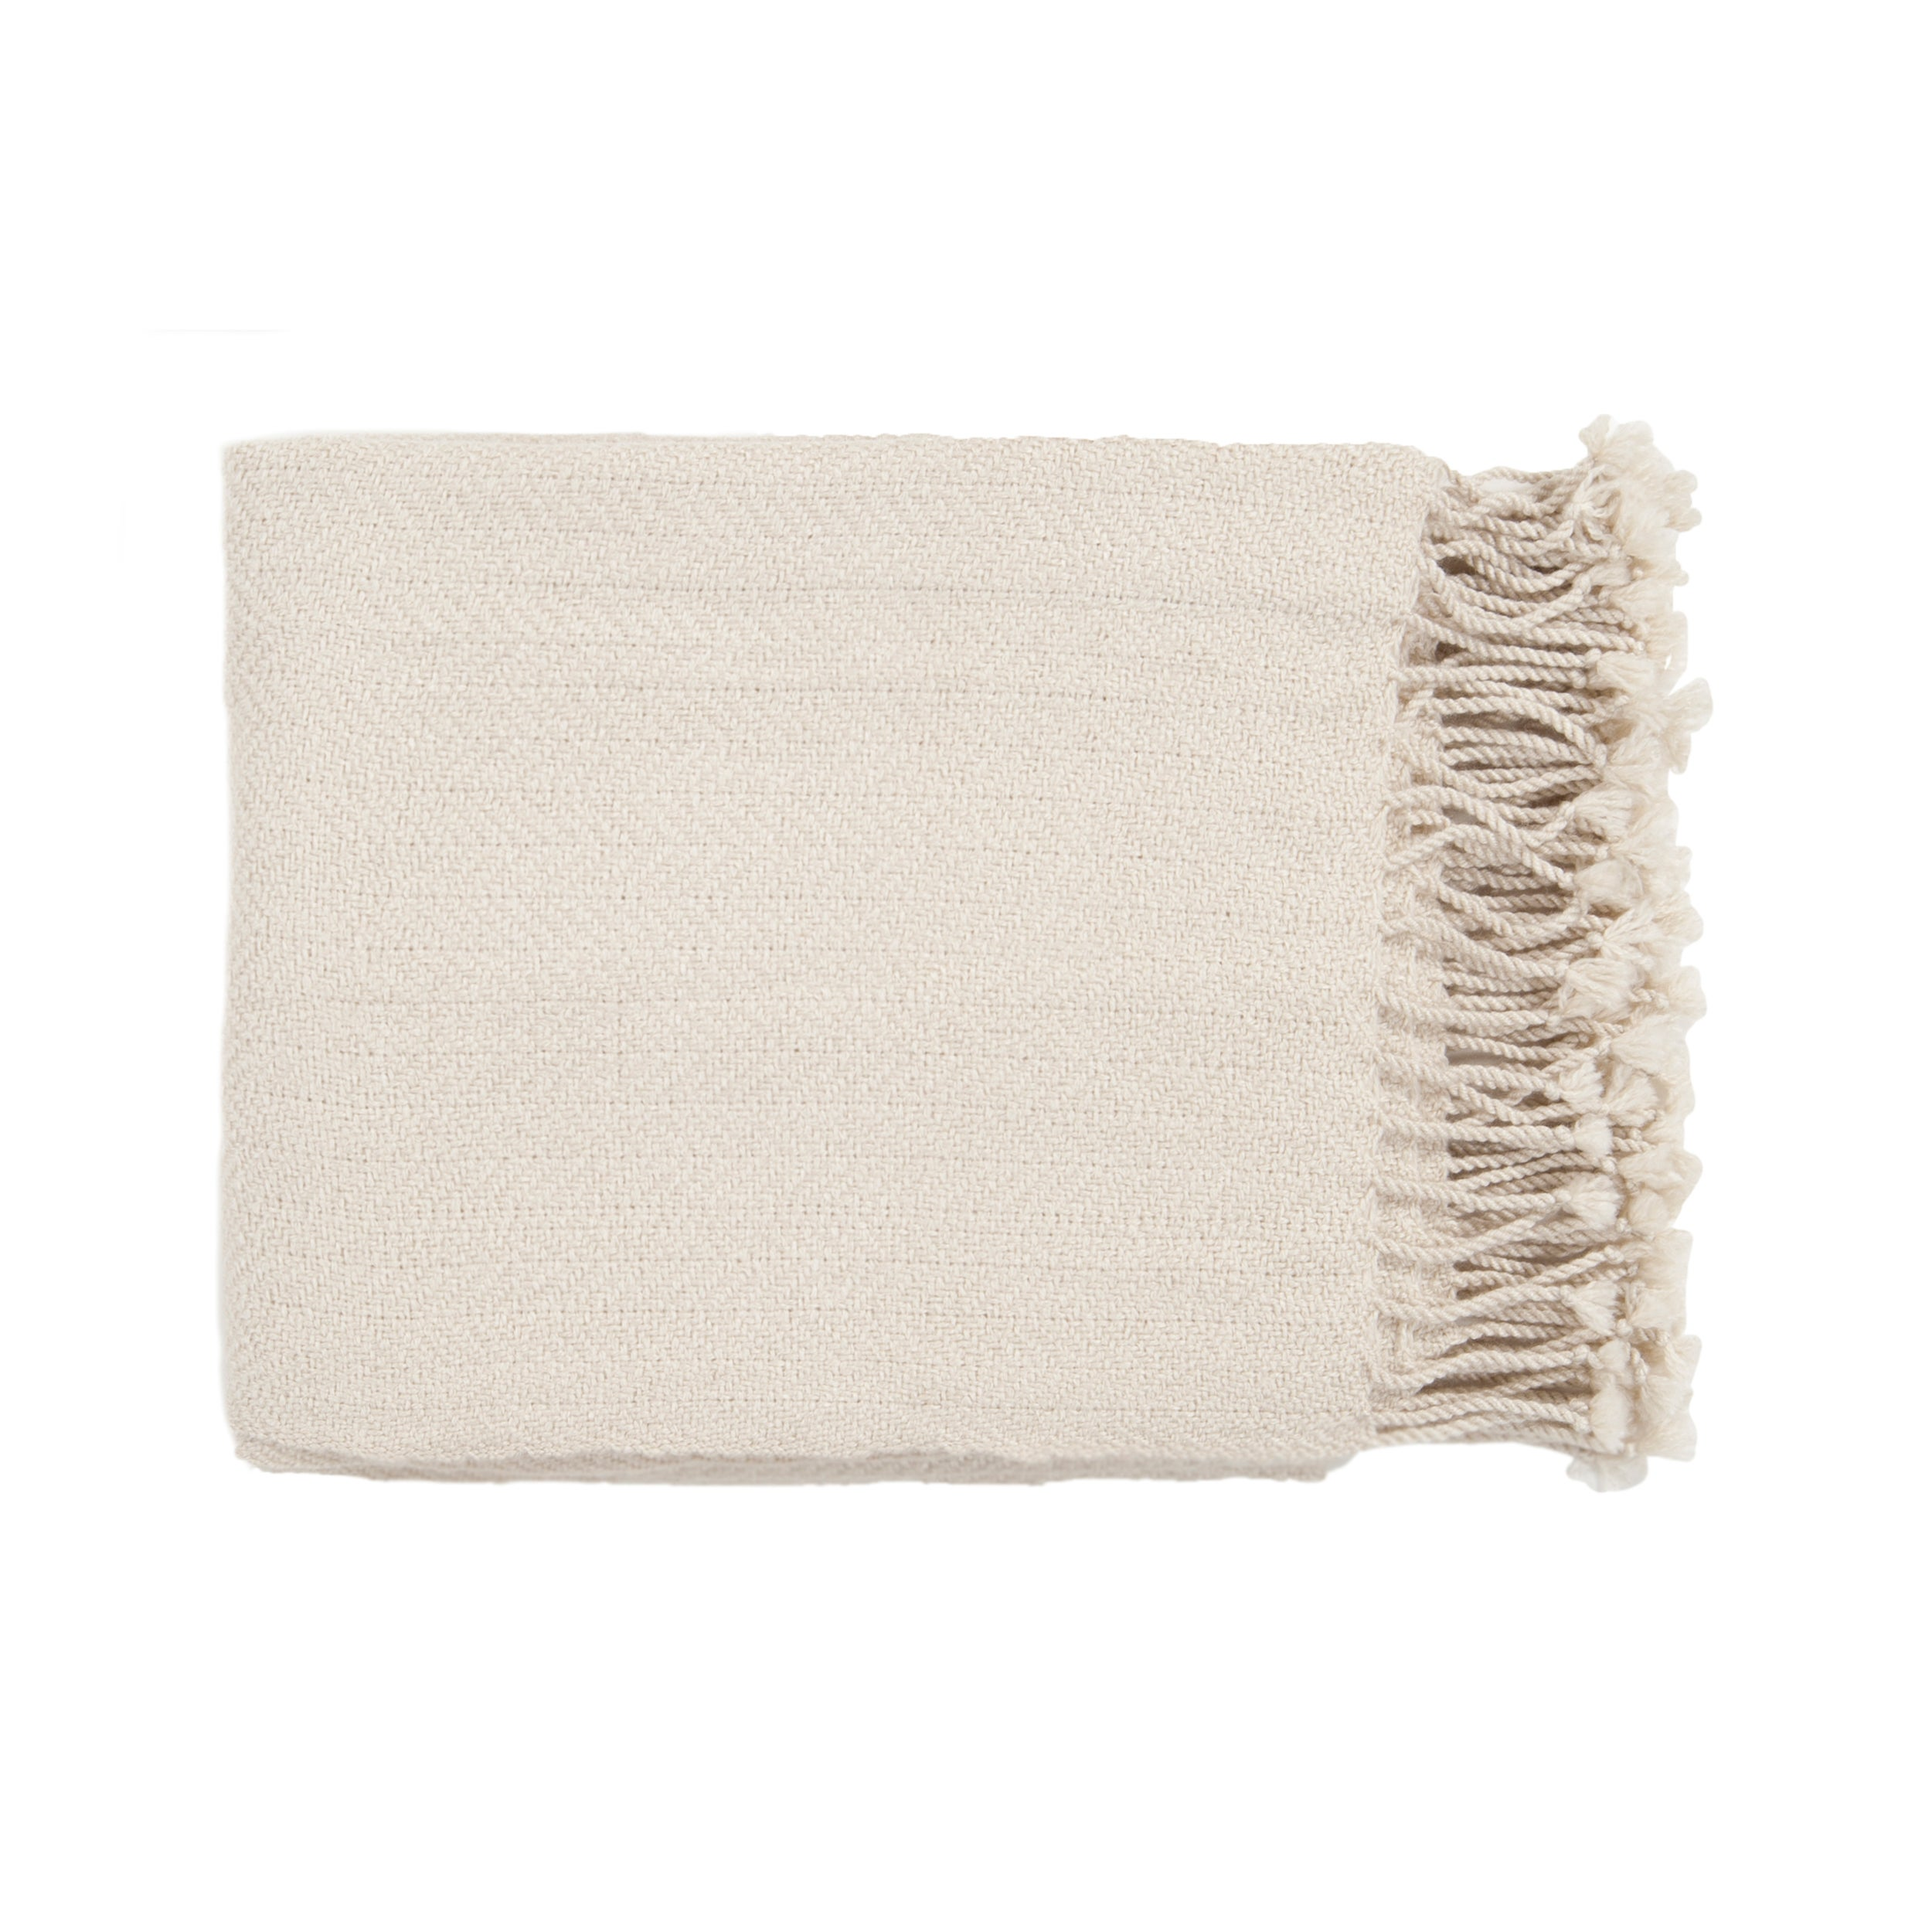 Woven Fordham Acrylic Throw Blanket (50 x 60)